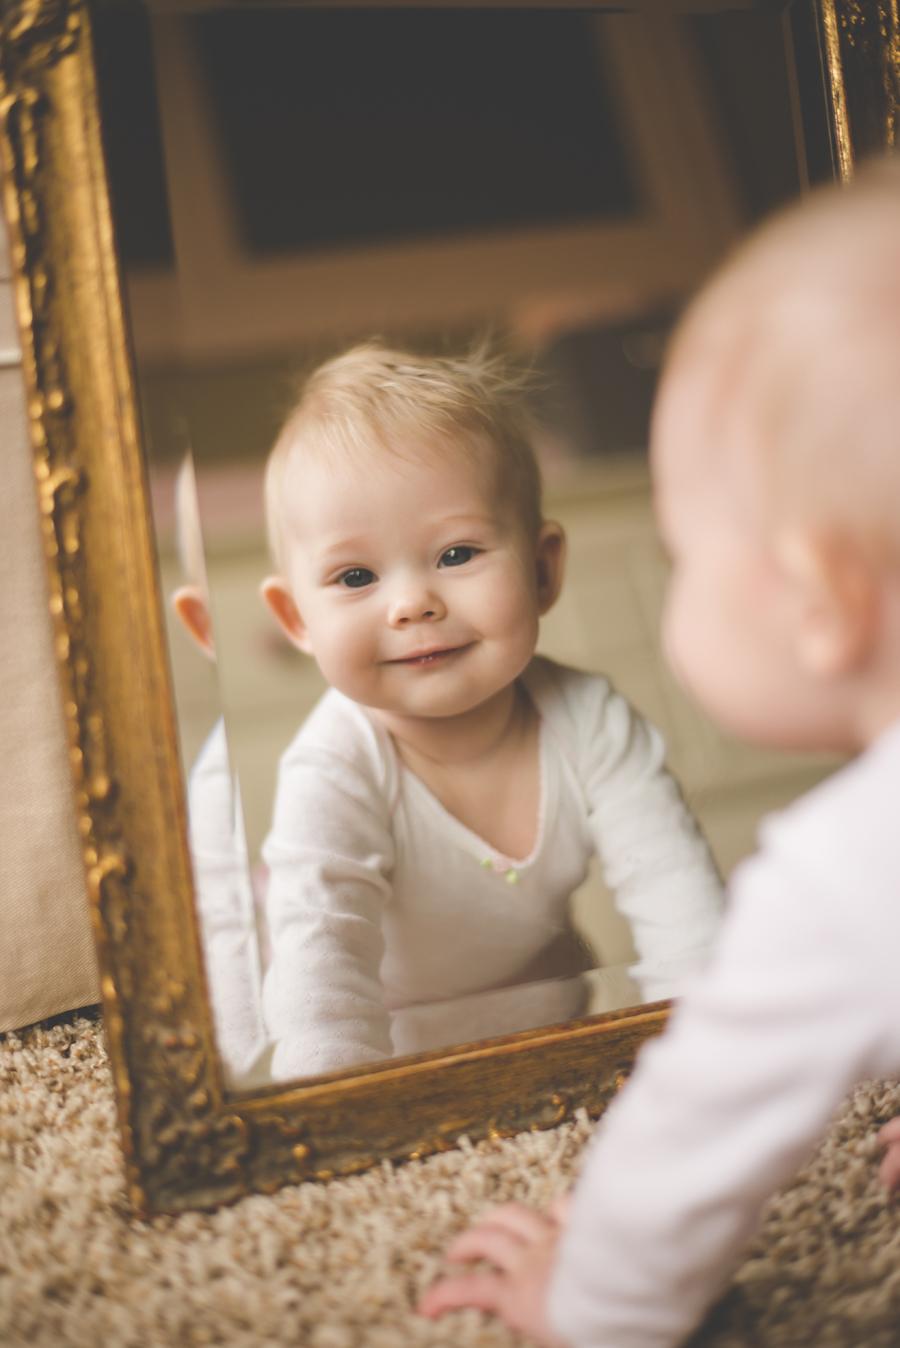 tulsa-photographer-baby-smiling-mirror